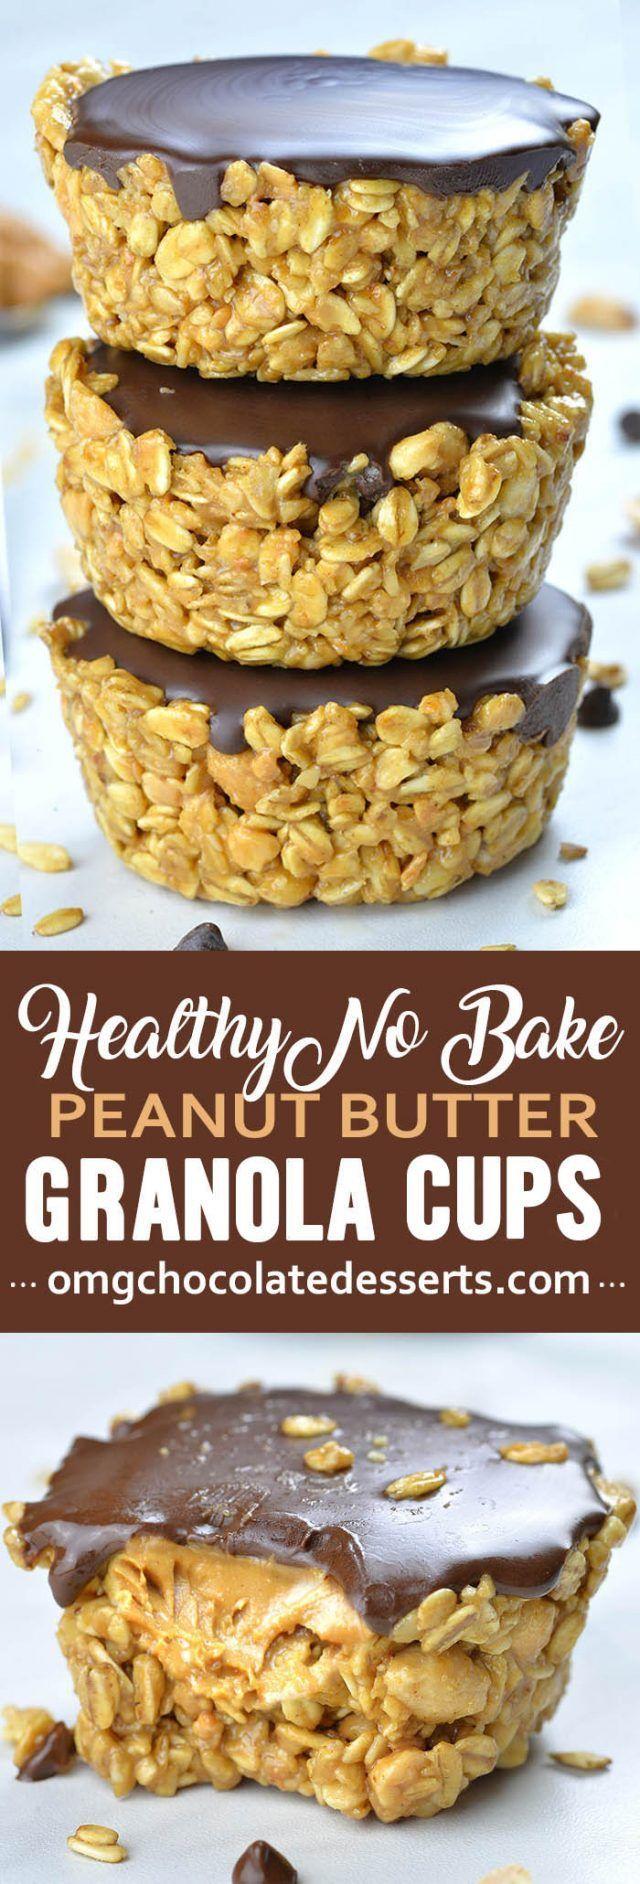 Keine Bake Erdnussbutter Müsli Cups #peanutrecipes